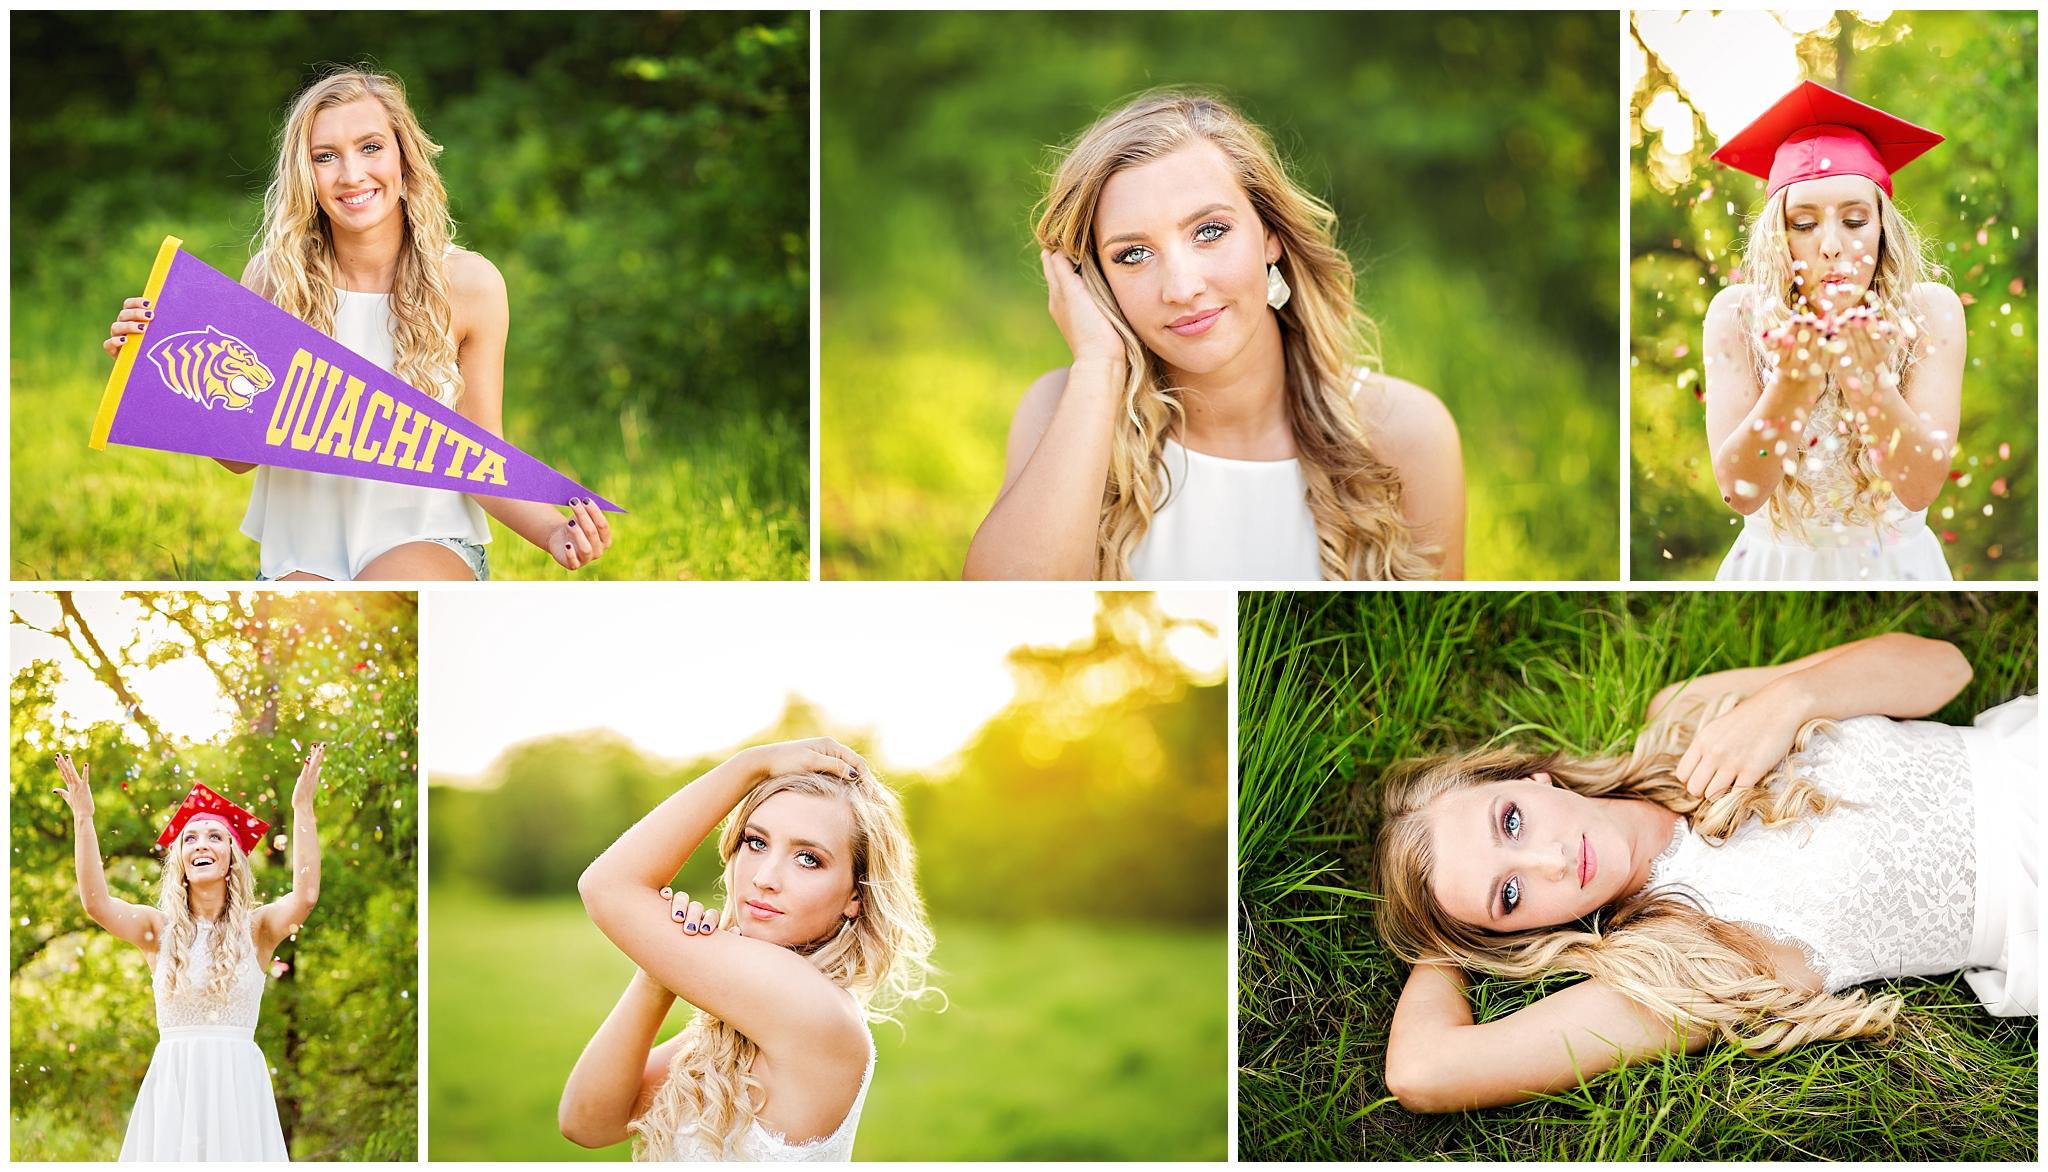 kylee-swisher-photography-senior-photographer-texas-fort-worth-tx-dfw-haslet